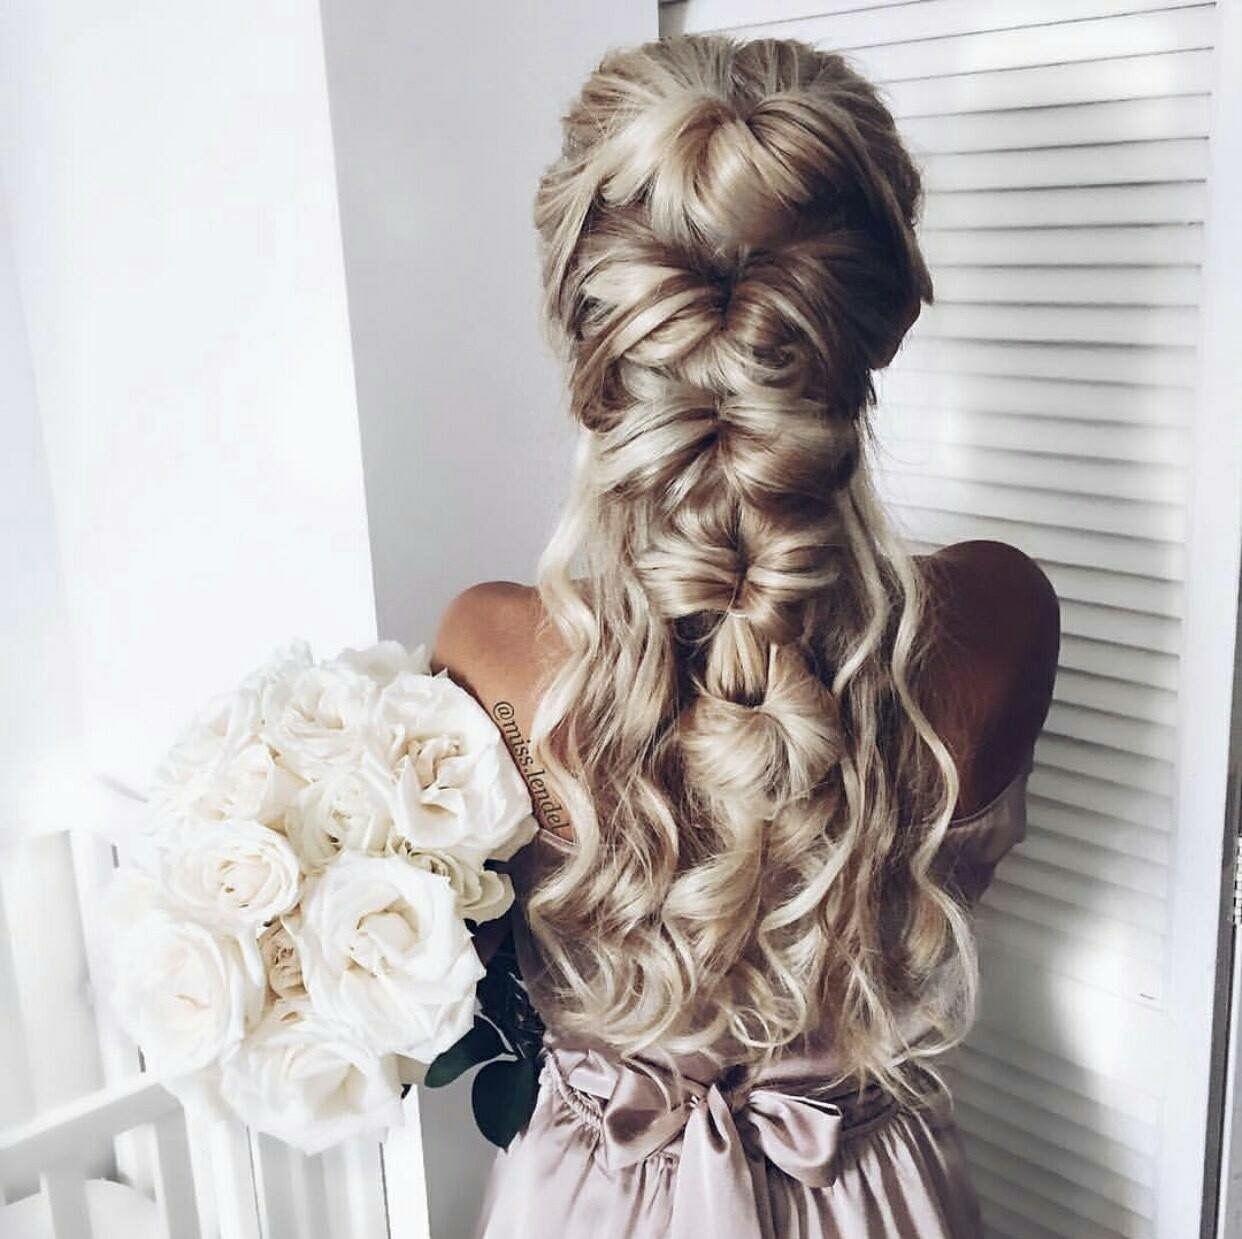 Pin by Христина Кочанковска on Hair <3 | Pinterest | Wedding